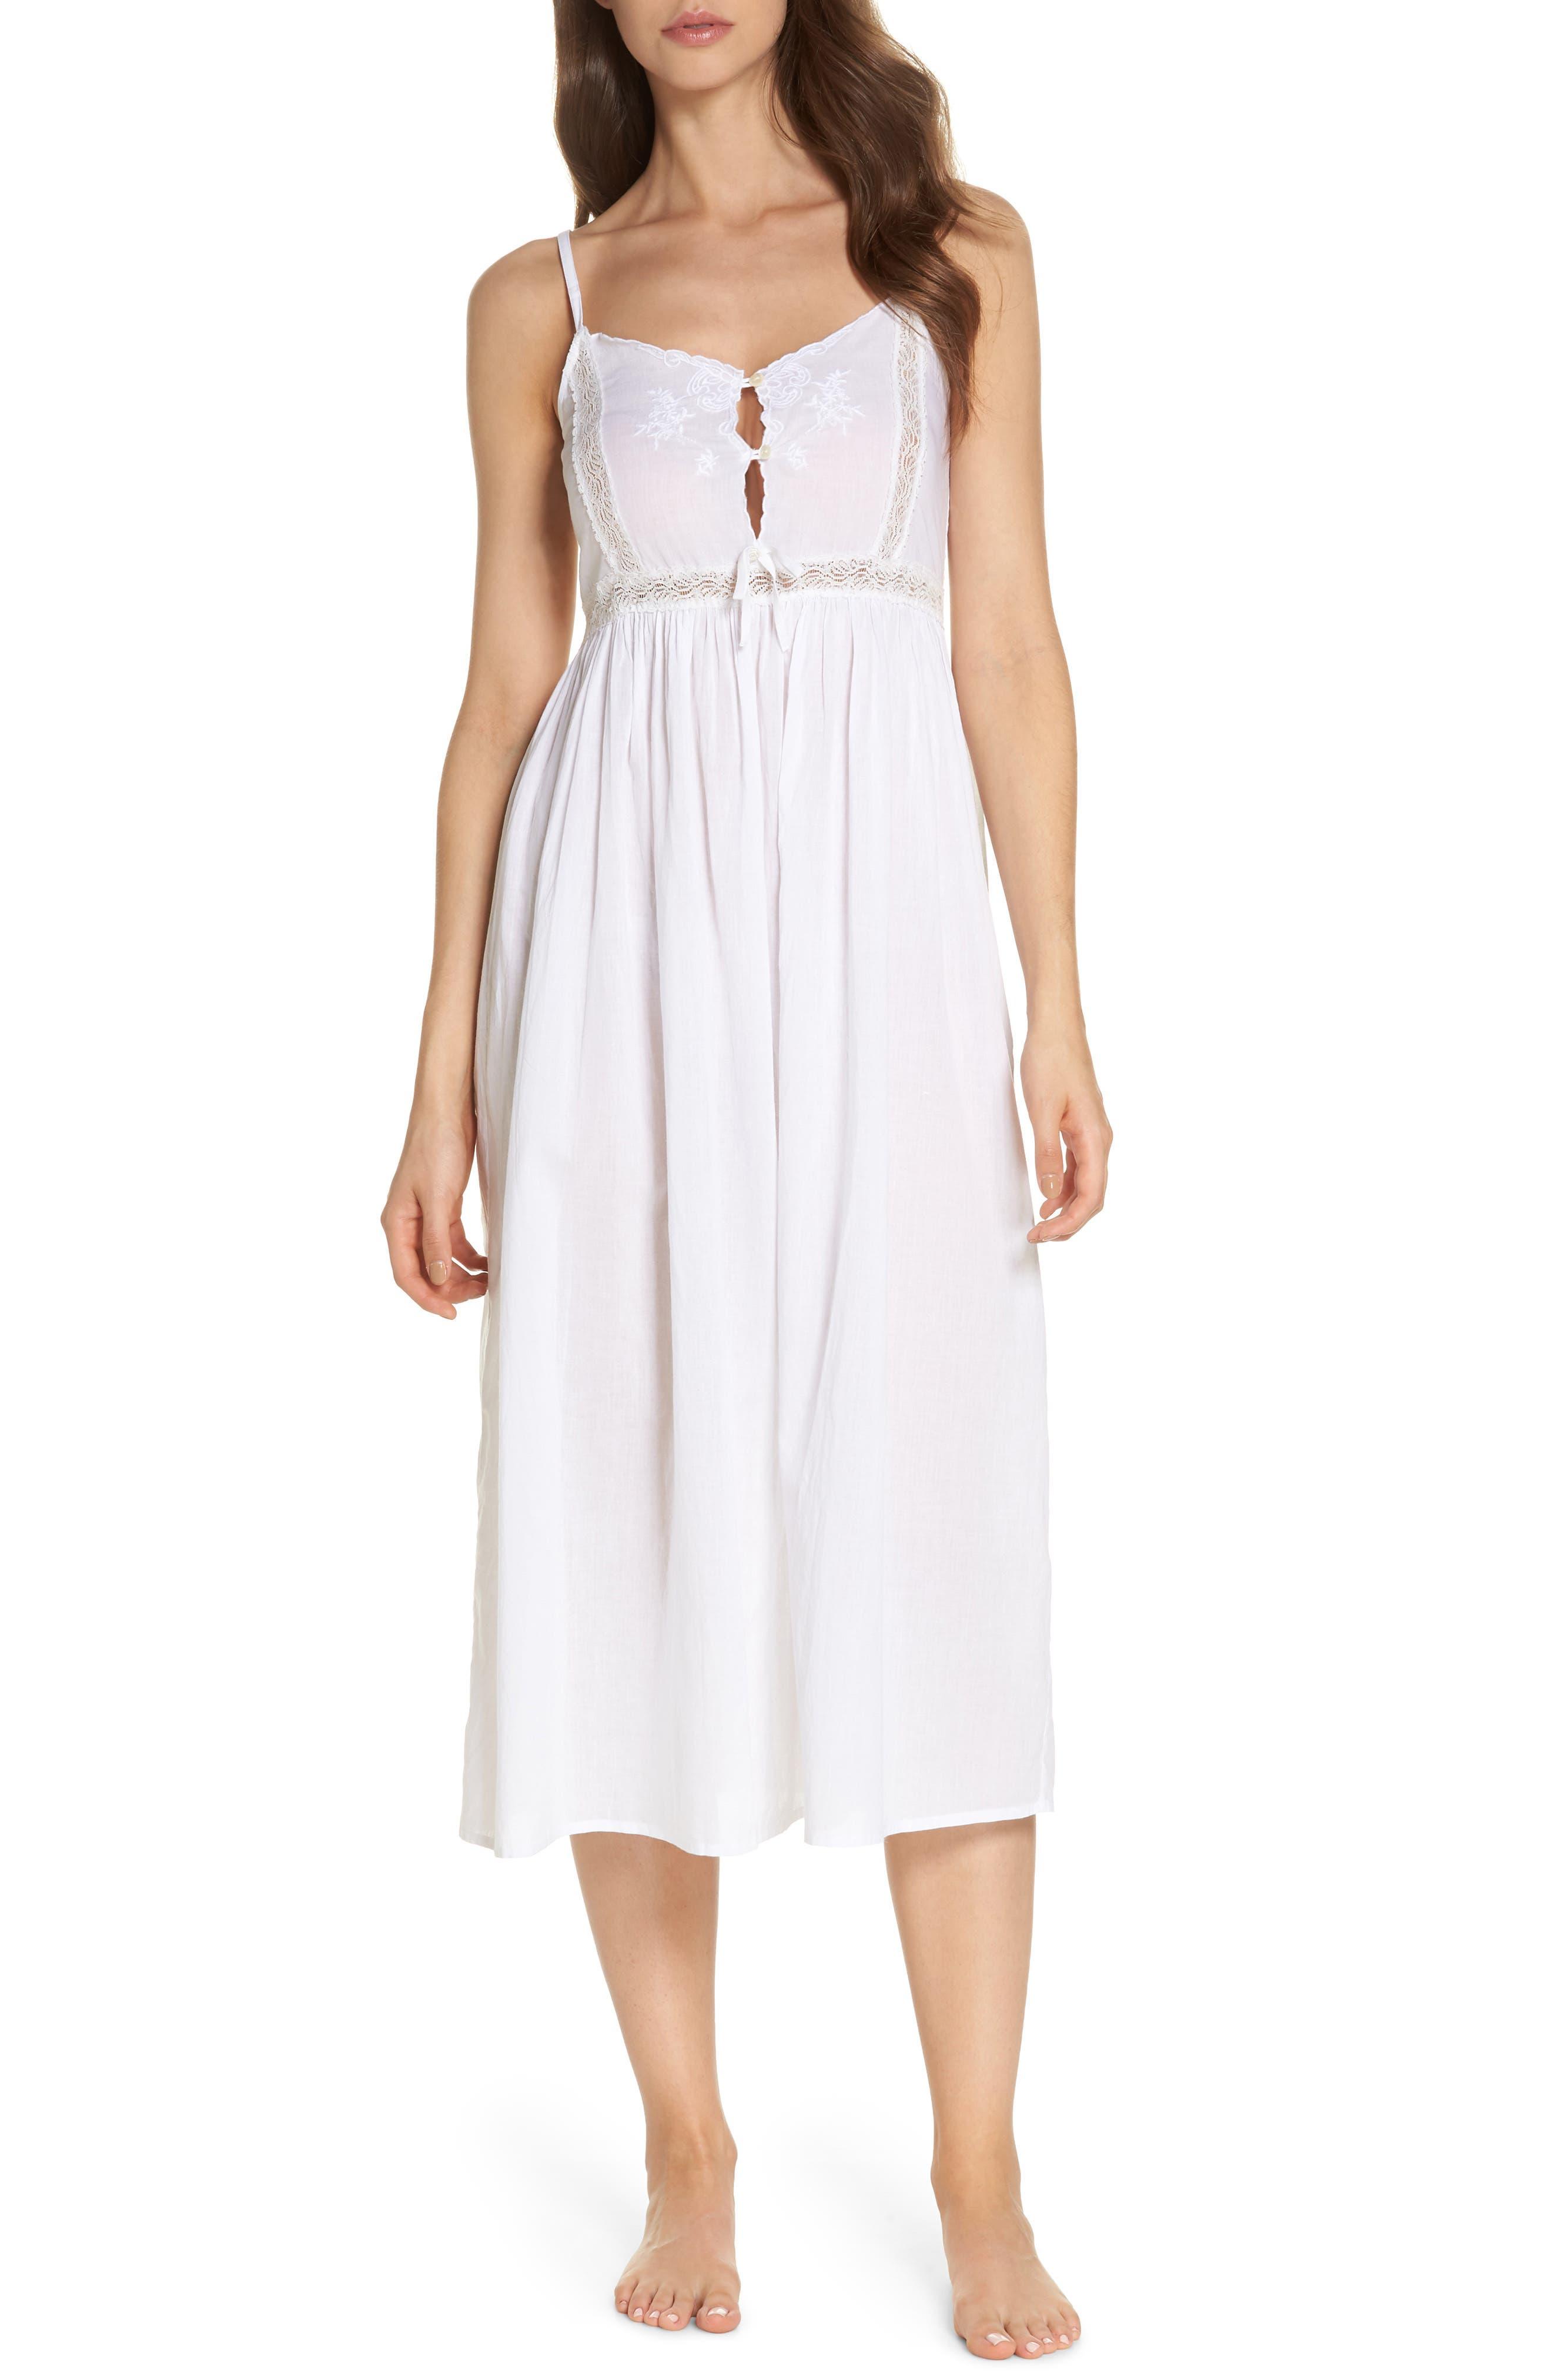 Lace Trim Nightgown,                             Main thumbnail 1, color,                             White